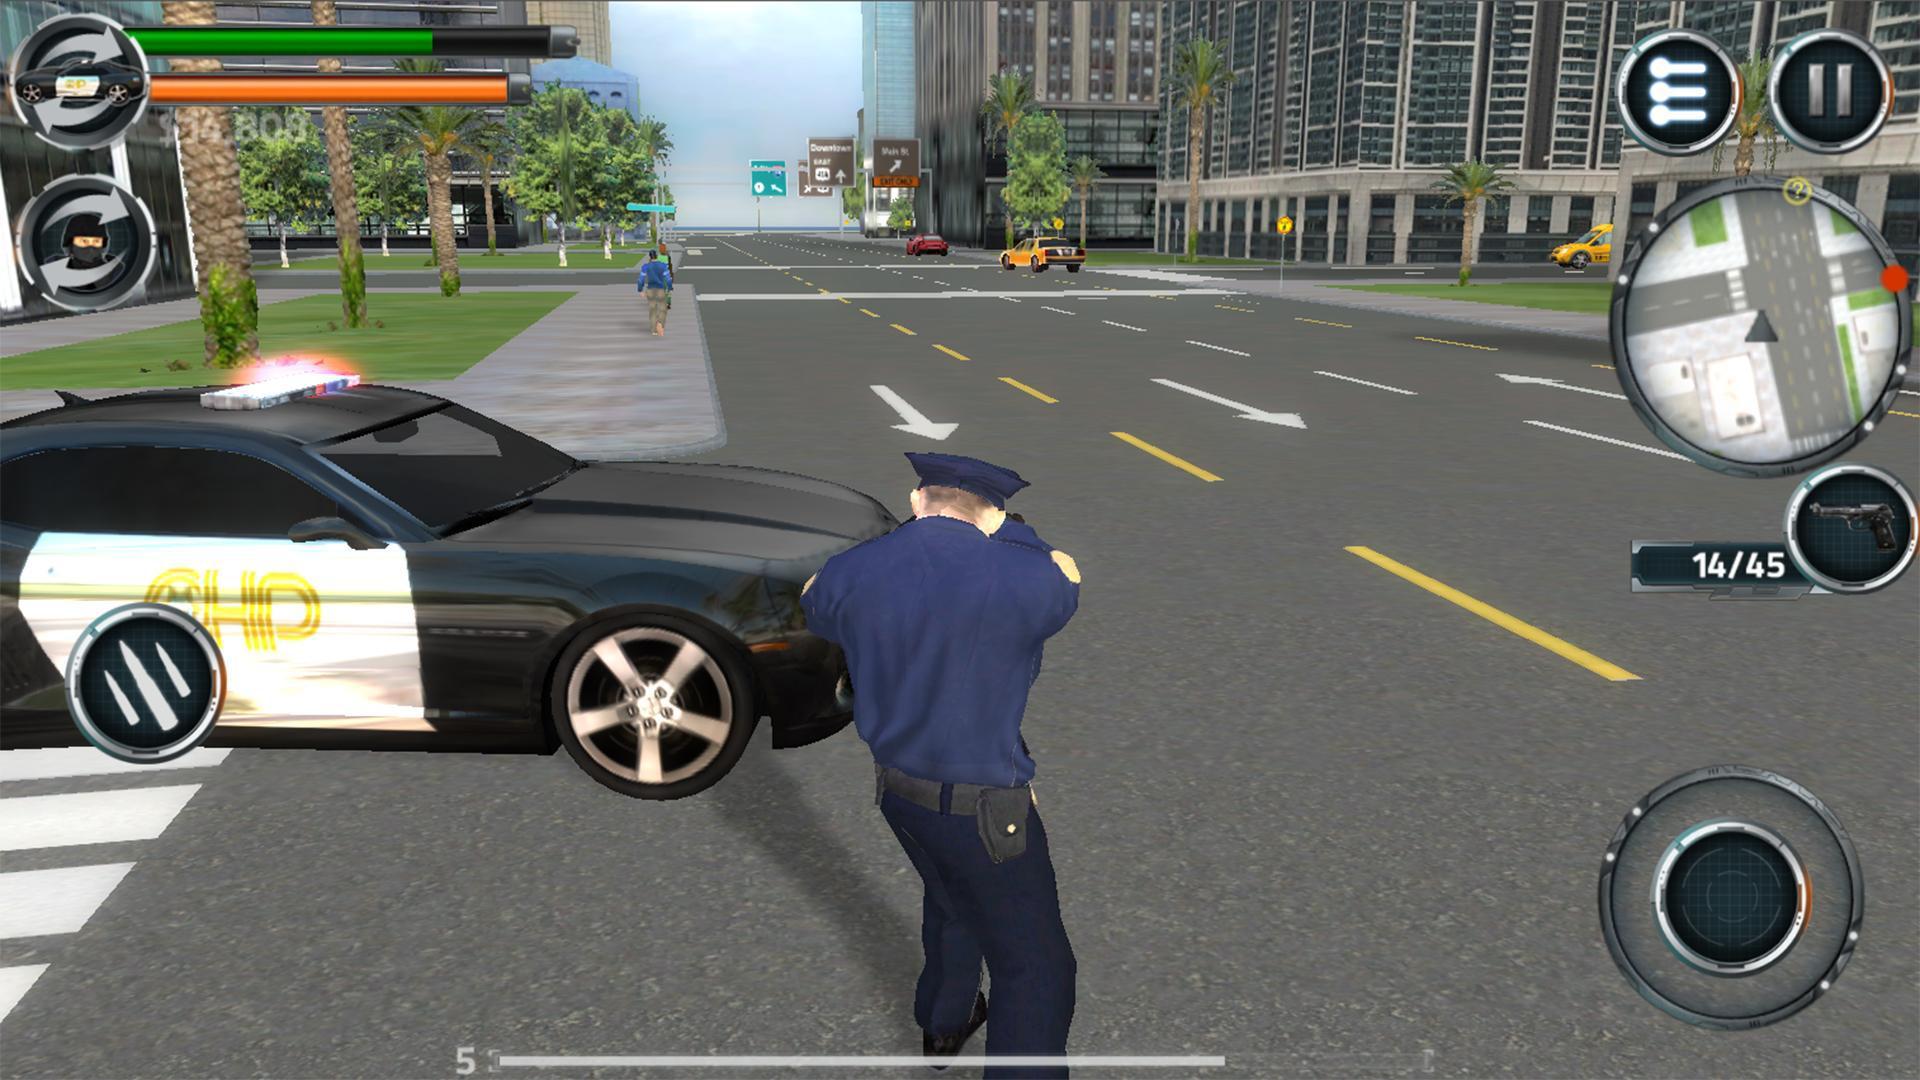 Crimopolis - Cop Simulator 3D 游戏截图4